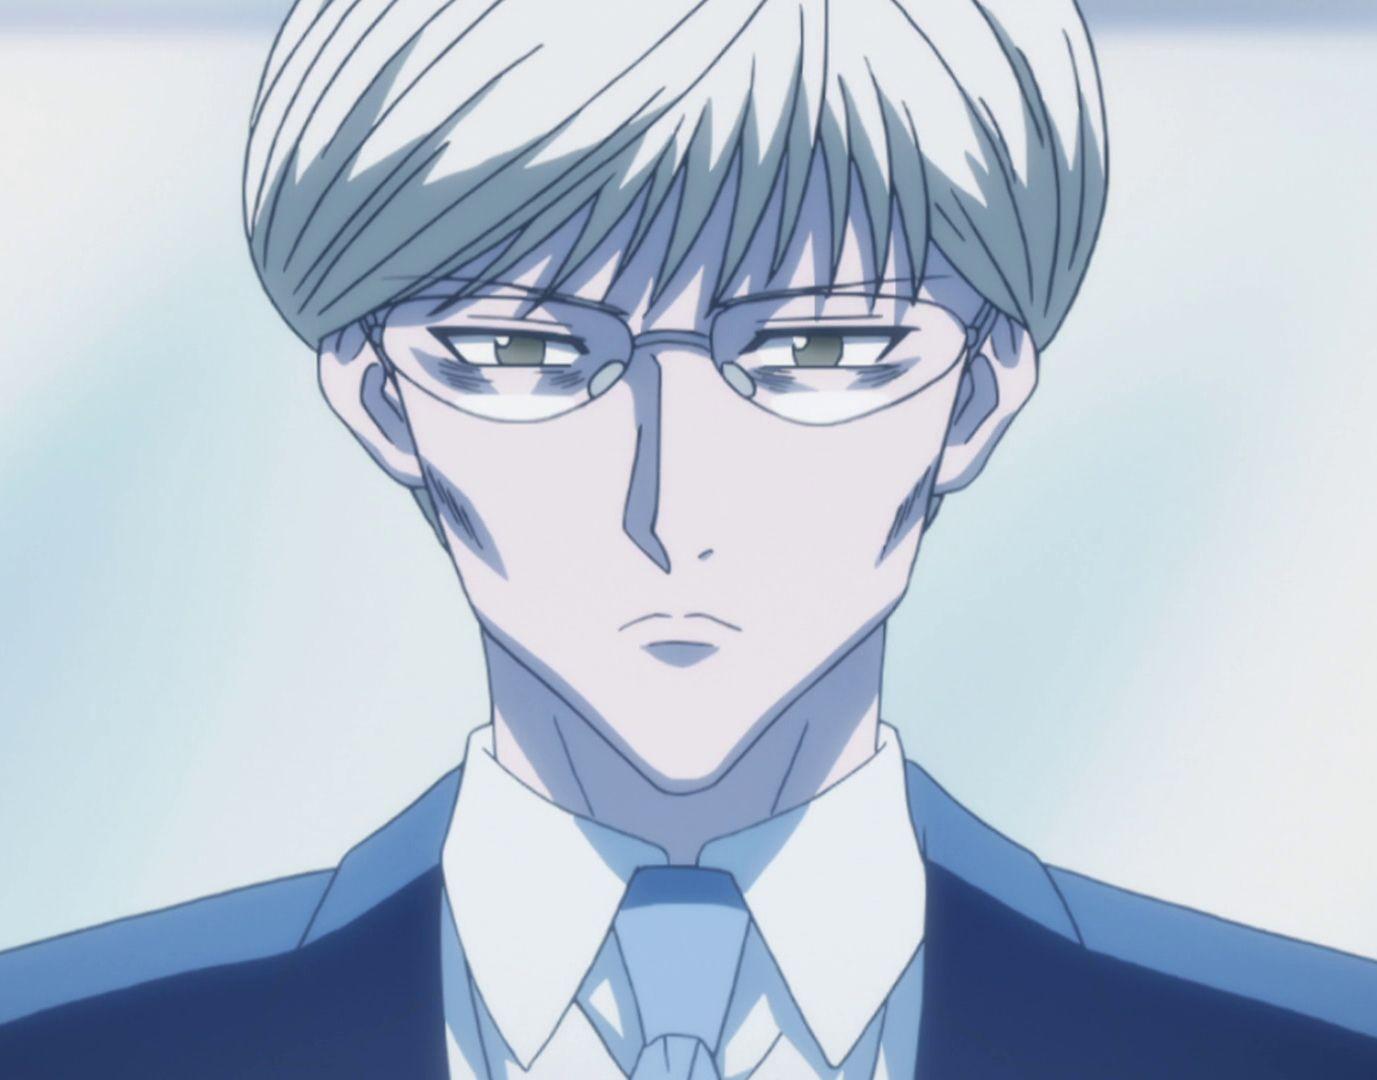 Knov With White Hair Hunter X Hunter Hunter X Hunter Anime Boyfriend Hunter